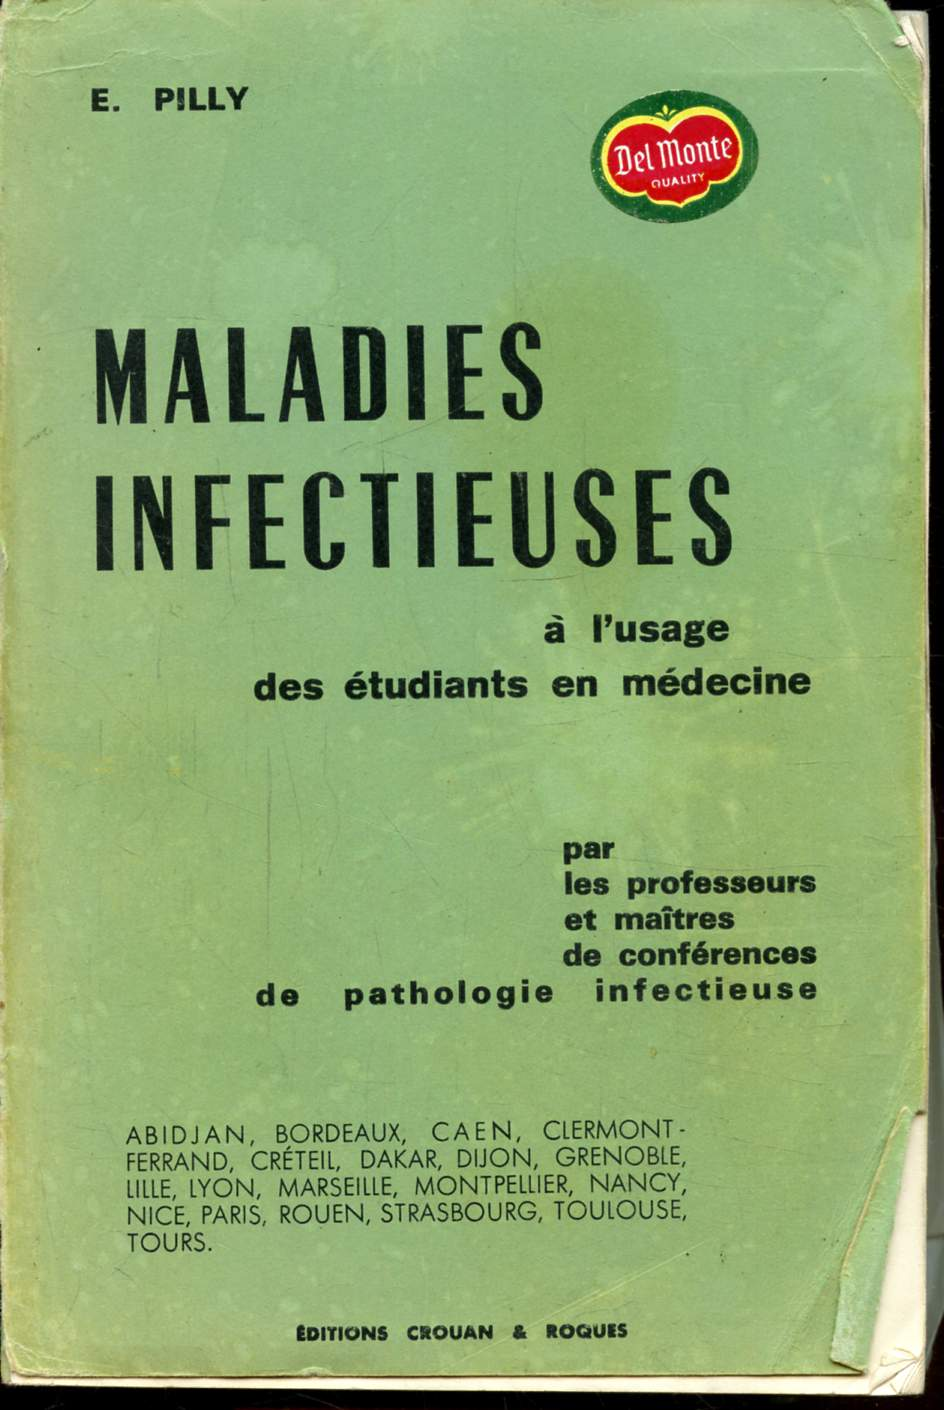 MALADIES INFECTIEUSES - A L'USAGE DES ETUDIANTS EN MEDECINE -